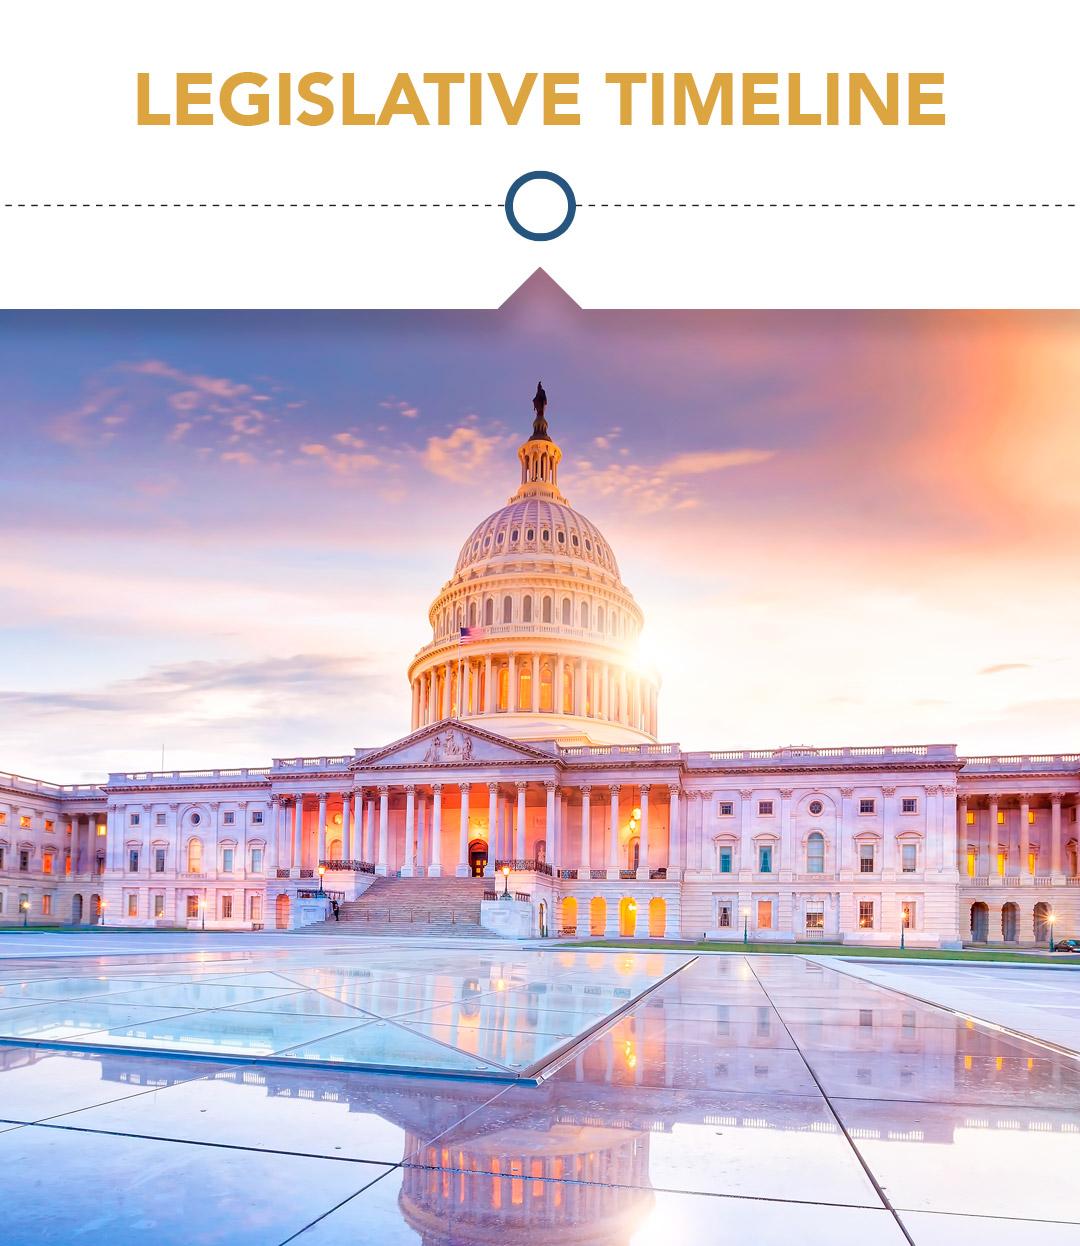 Legislative Timeline